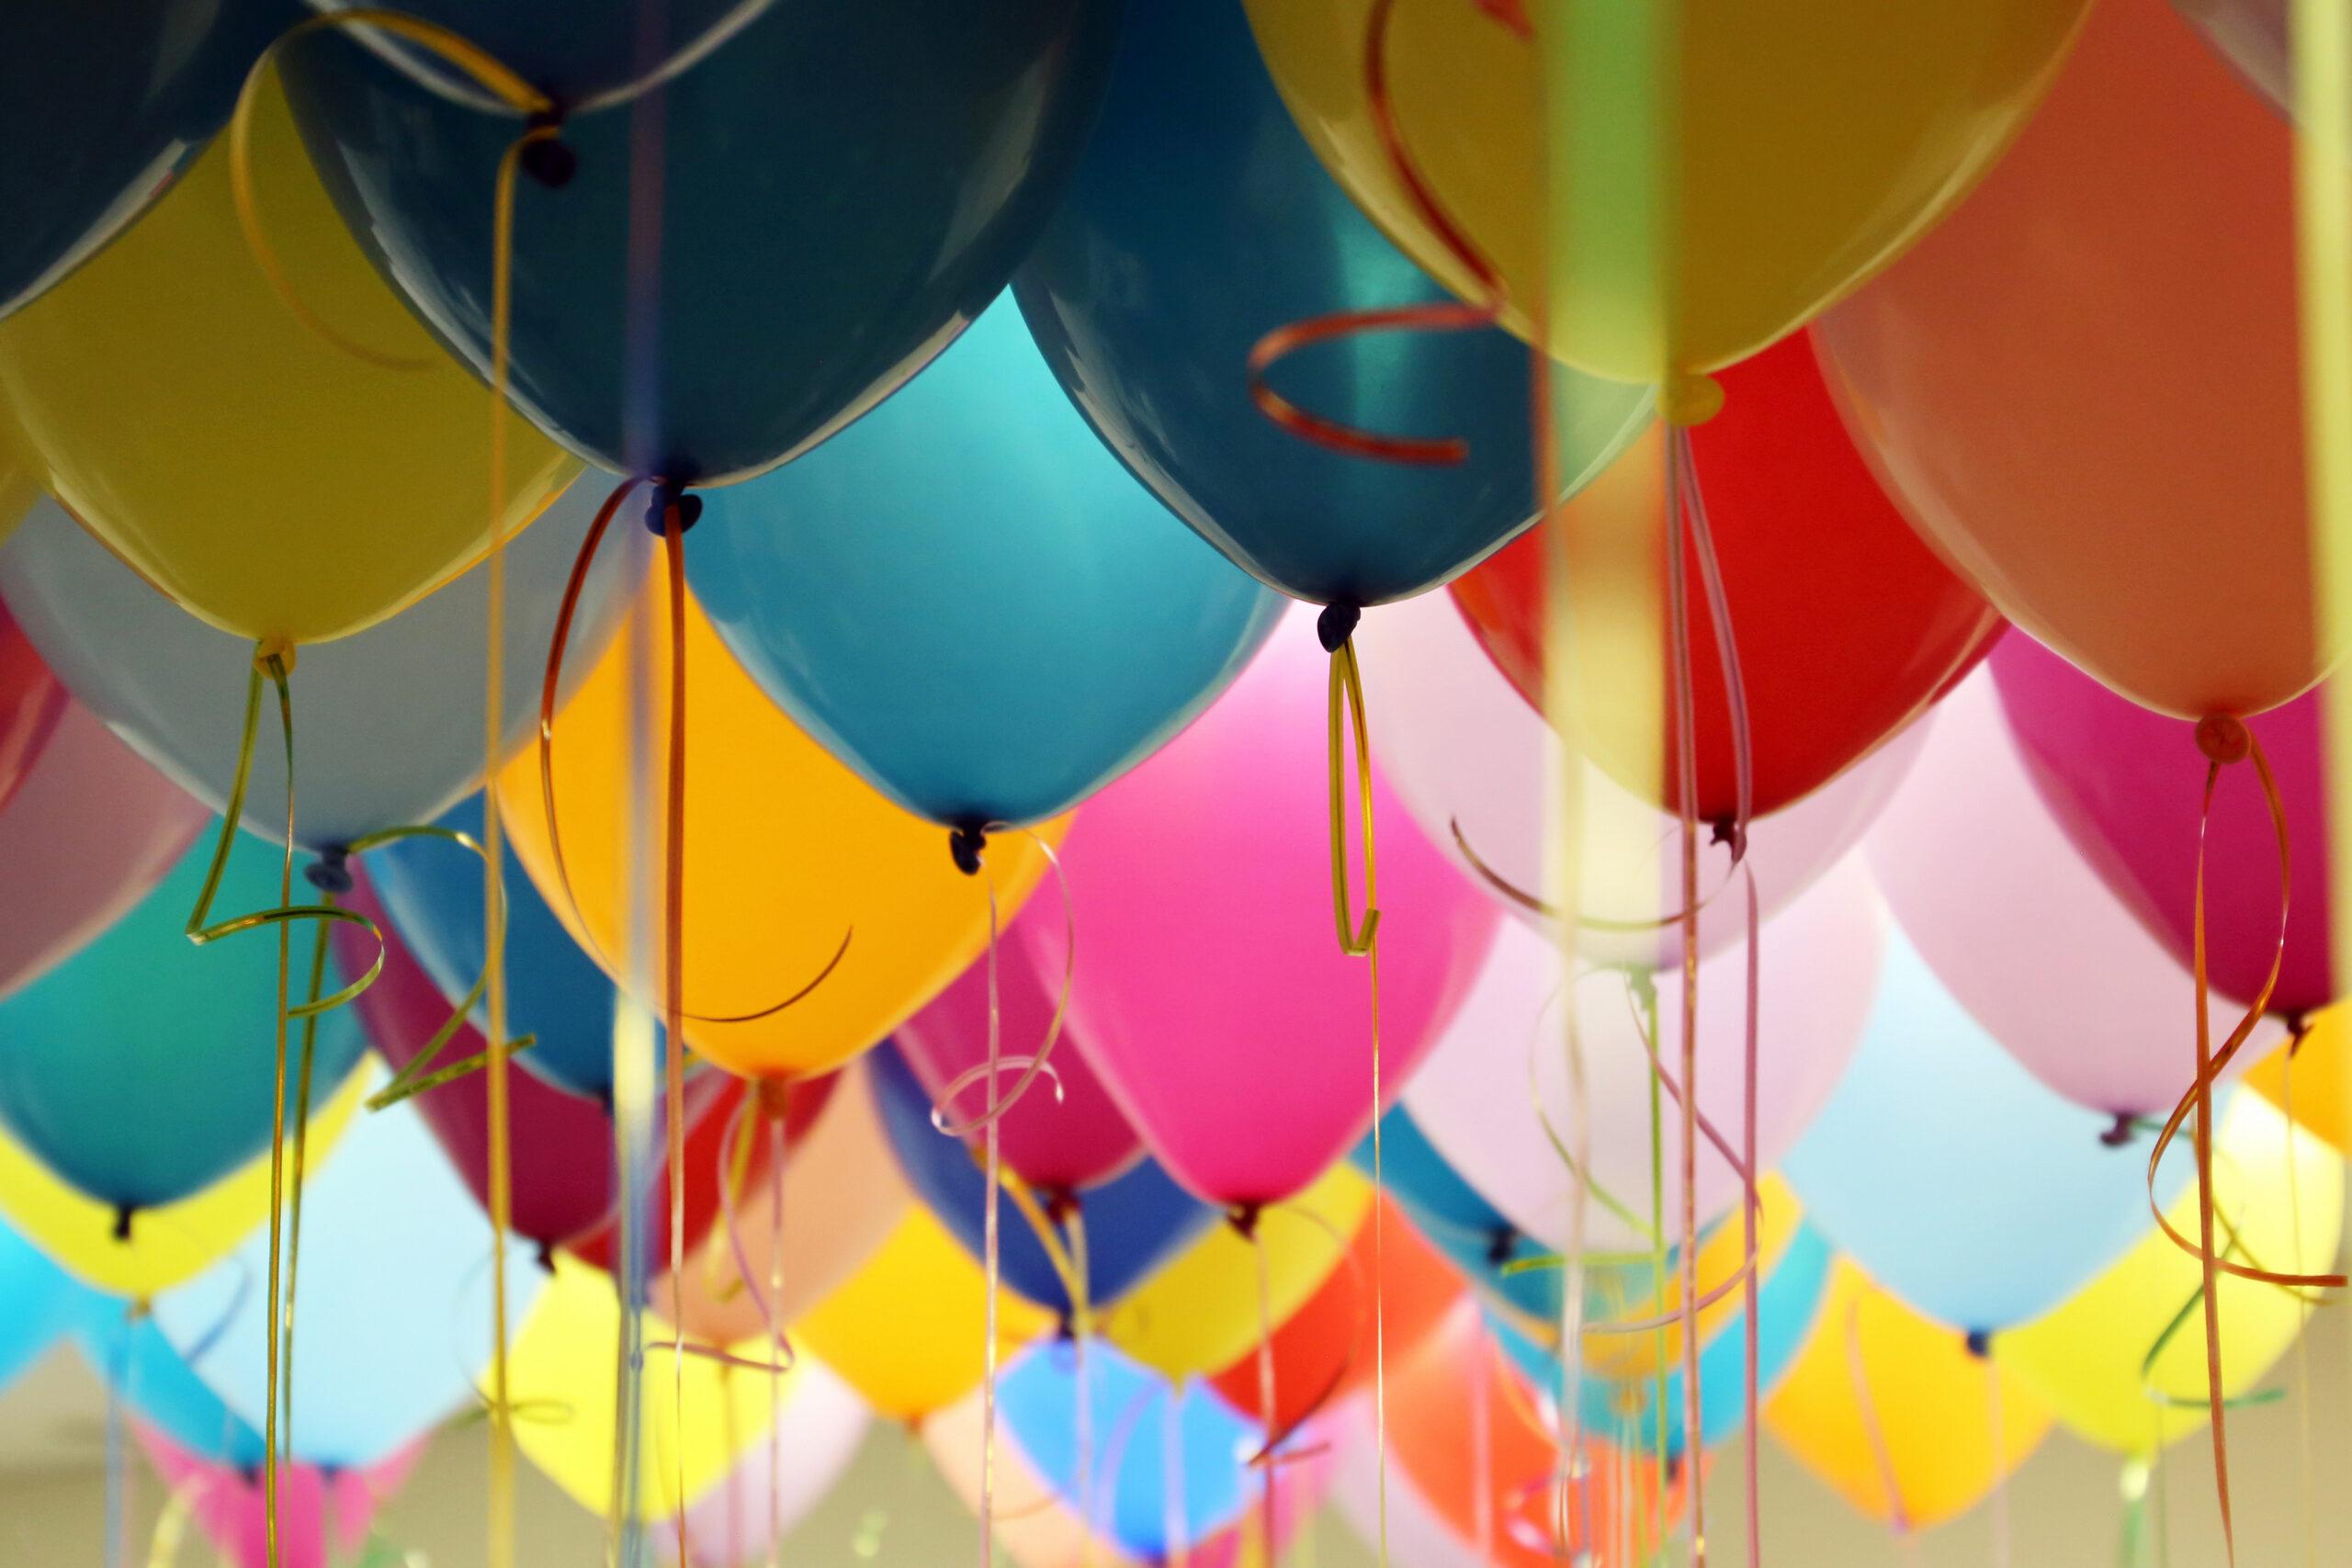 Birthday Party at CG Deposit